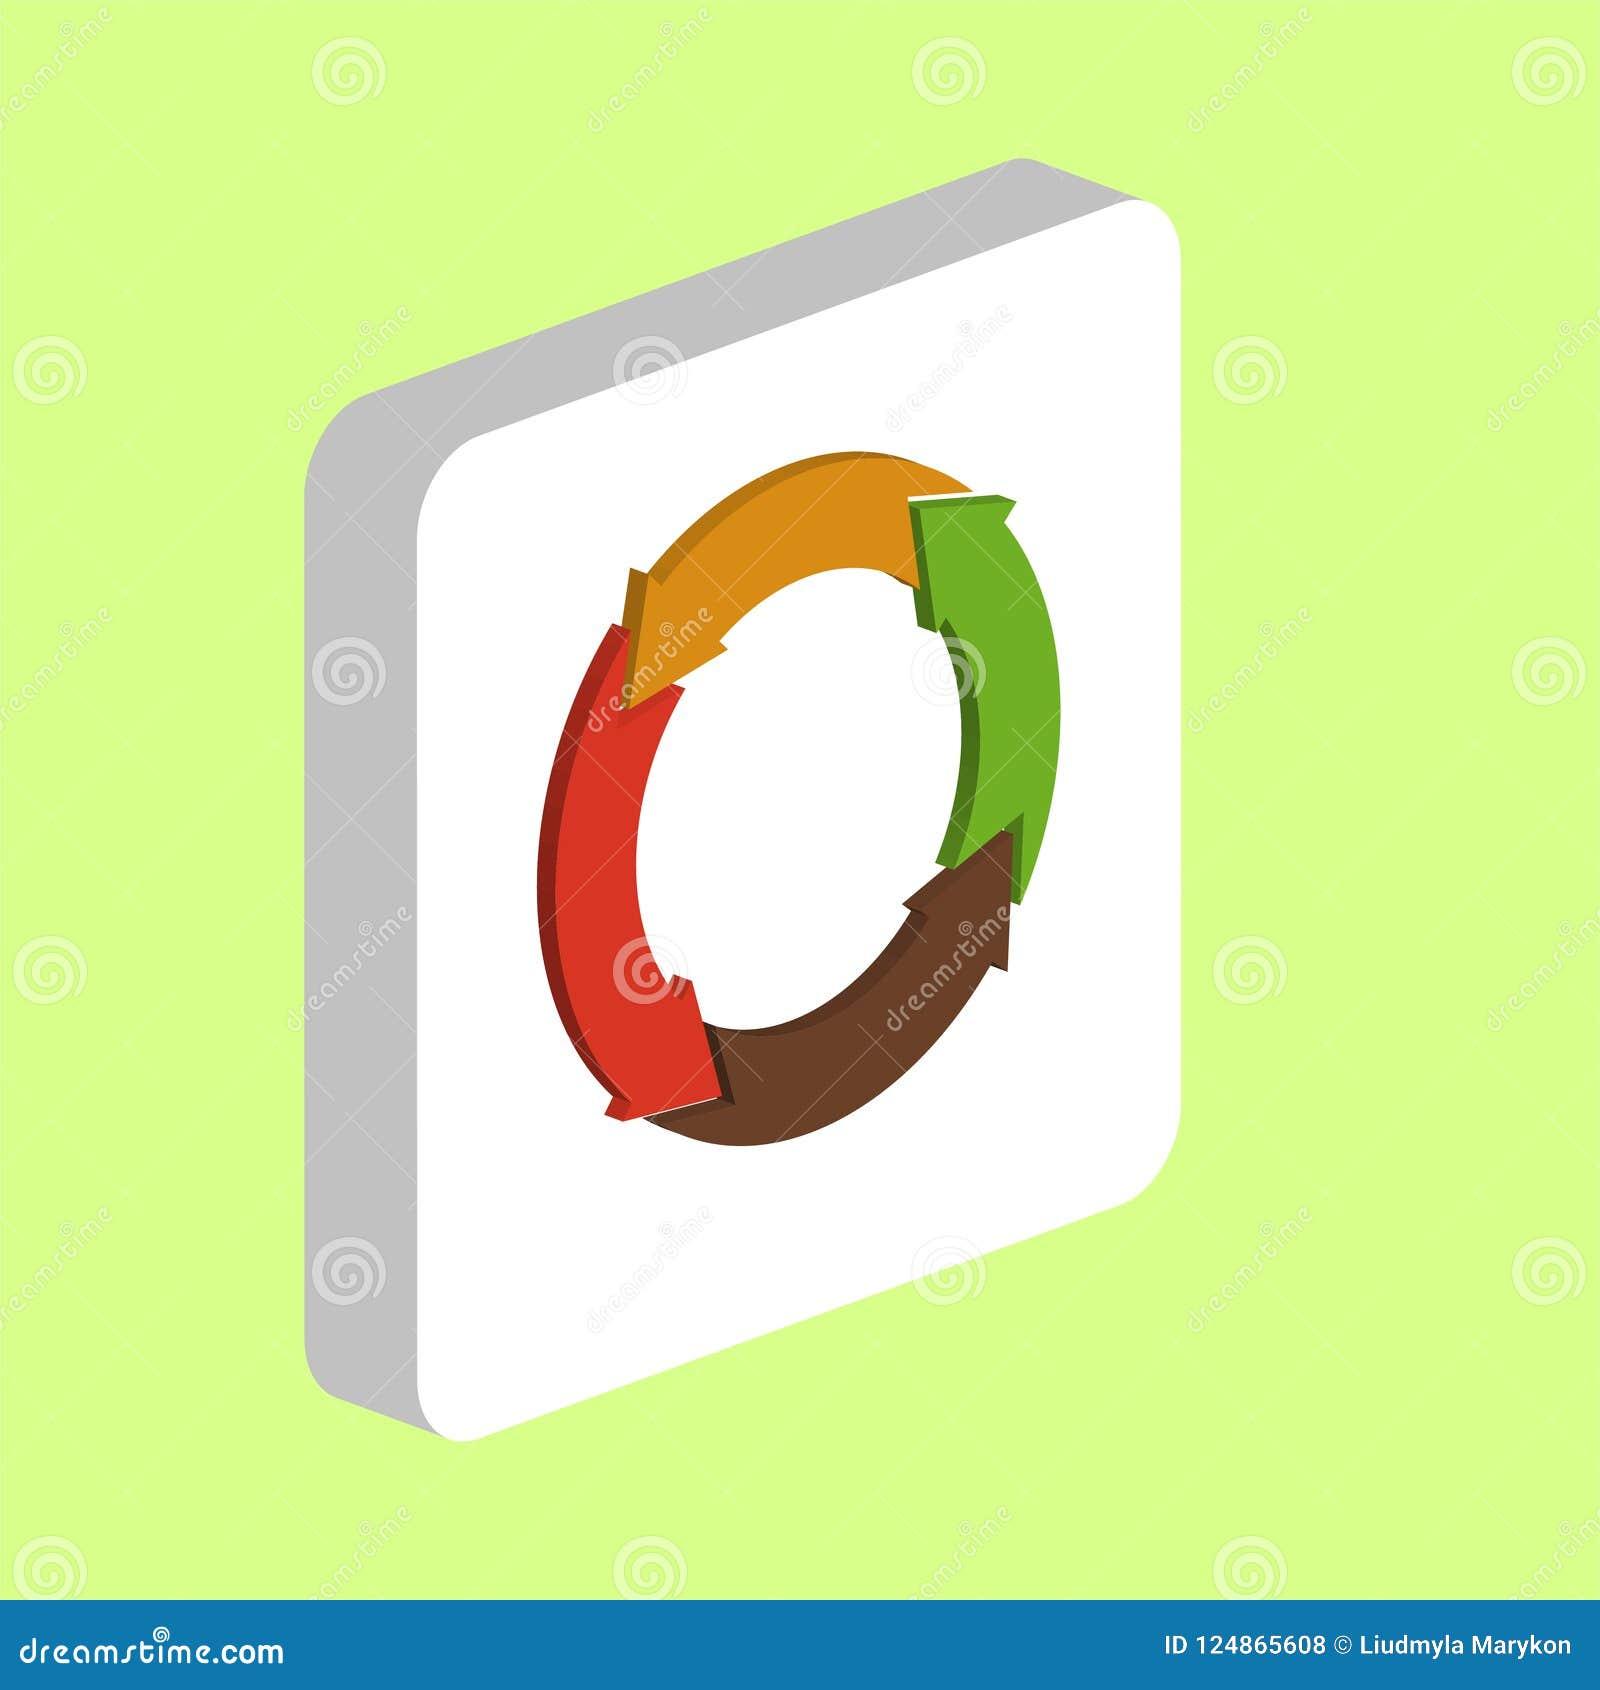 Organic Arrow Computer Symbol Stock Vector Illustration Of Logo